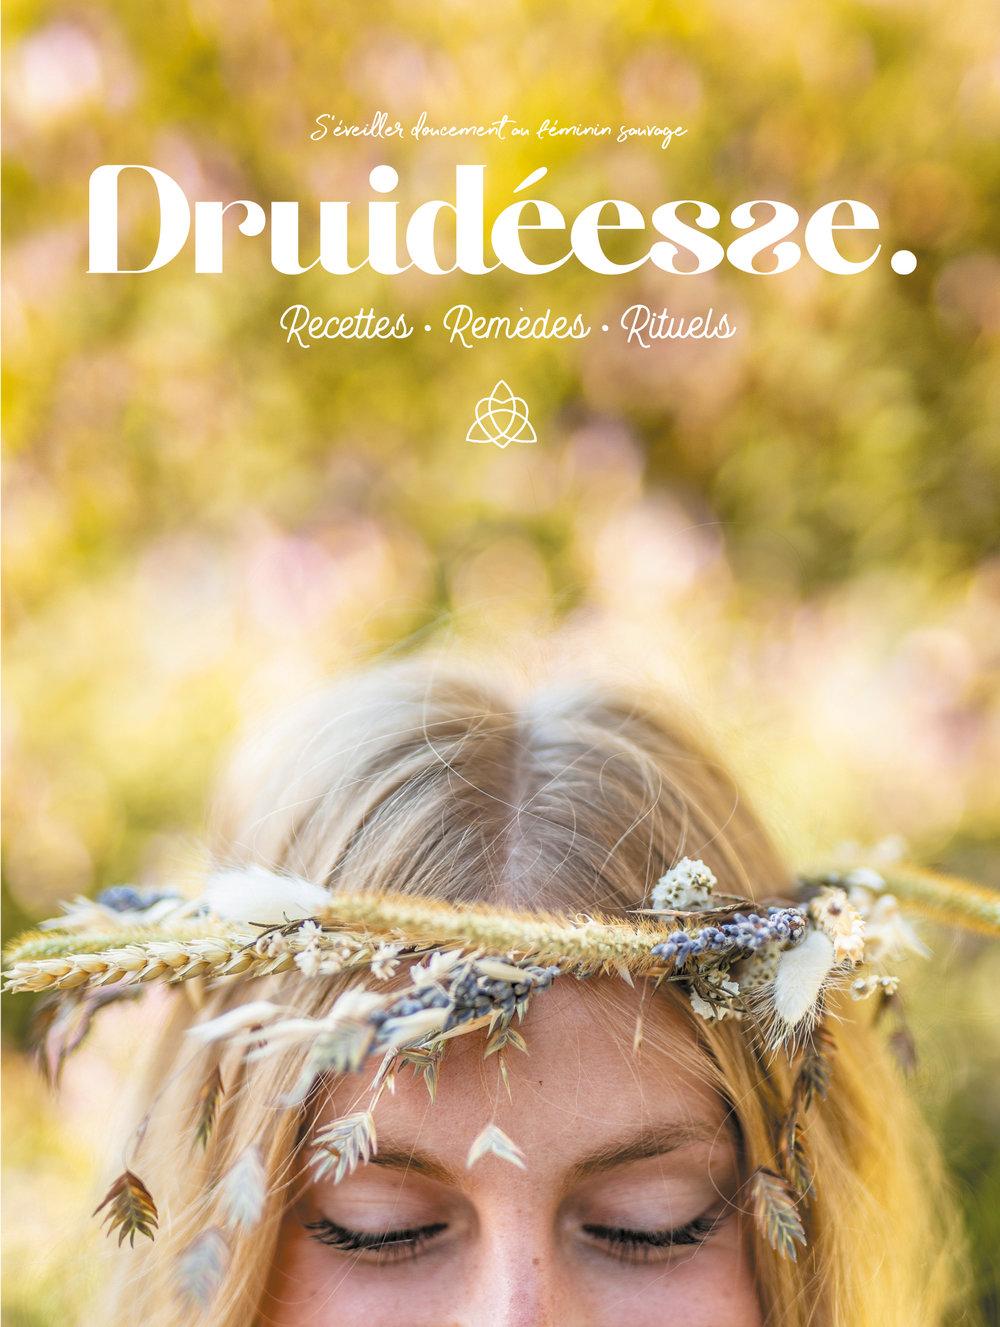 Lina Bou for Druidéesse